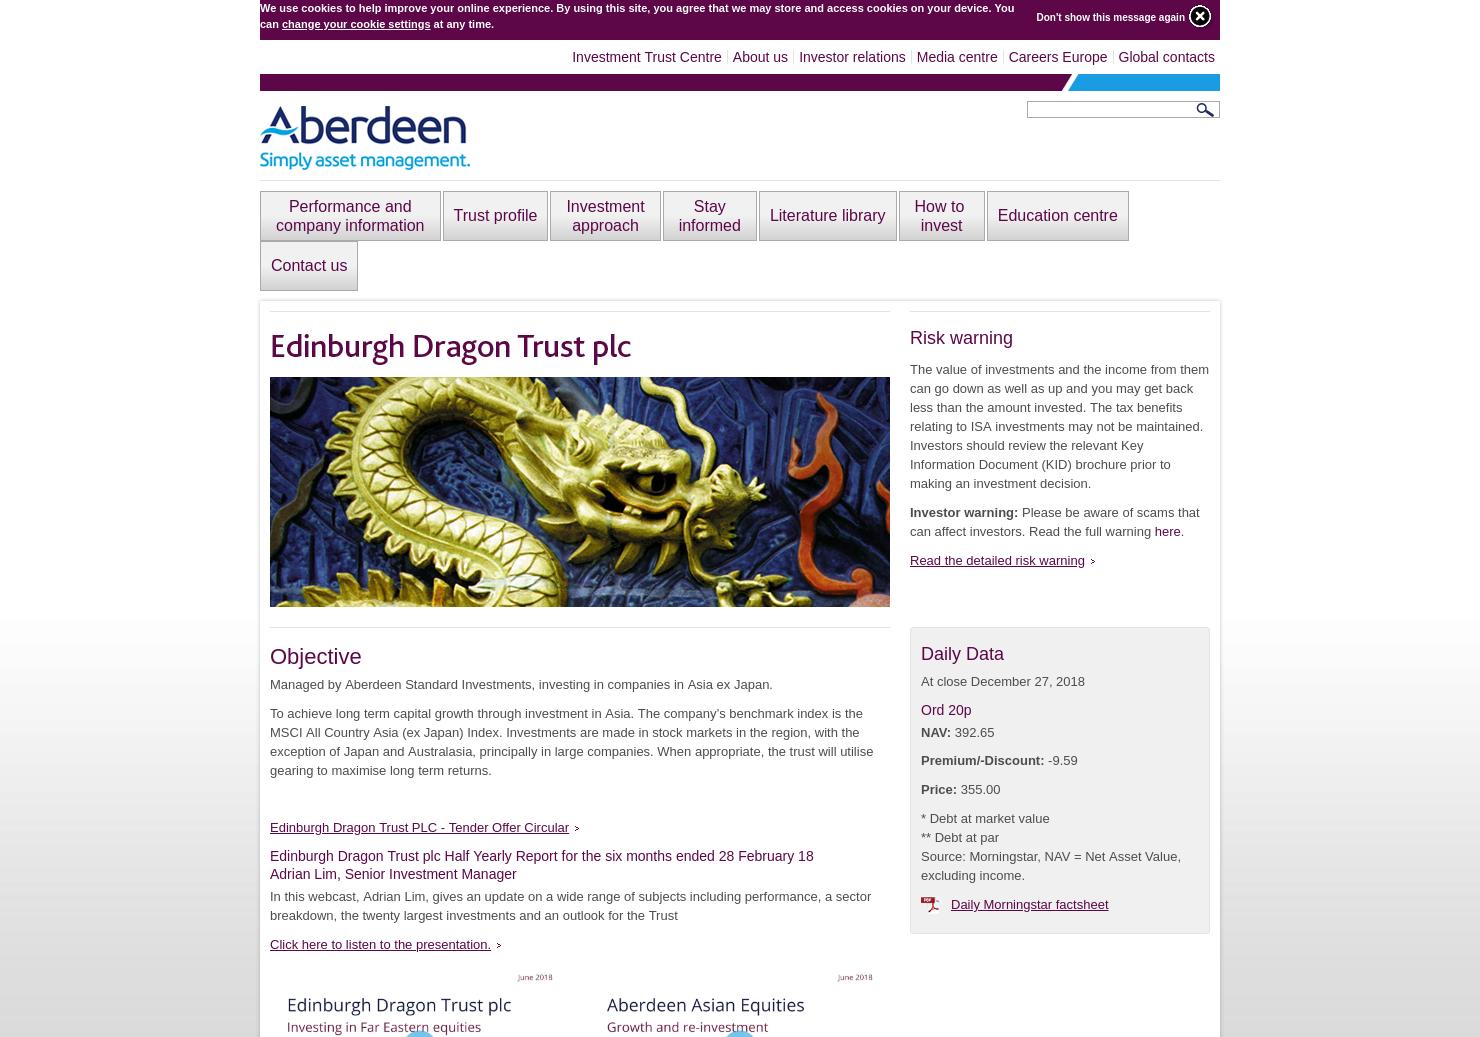 Edinburgh Dragon Trust plc Home Page